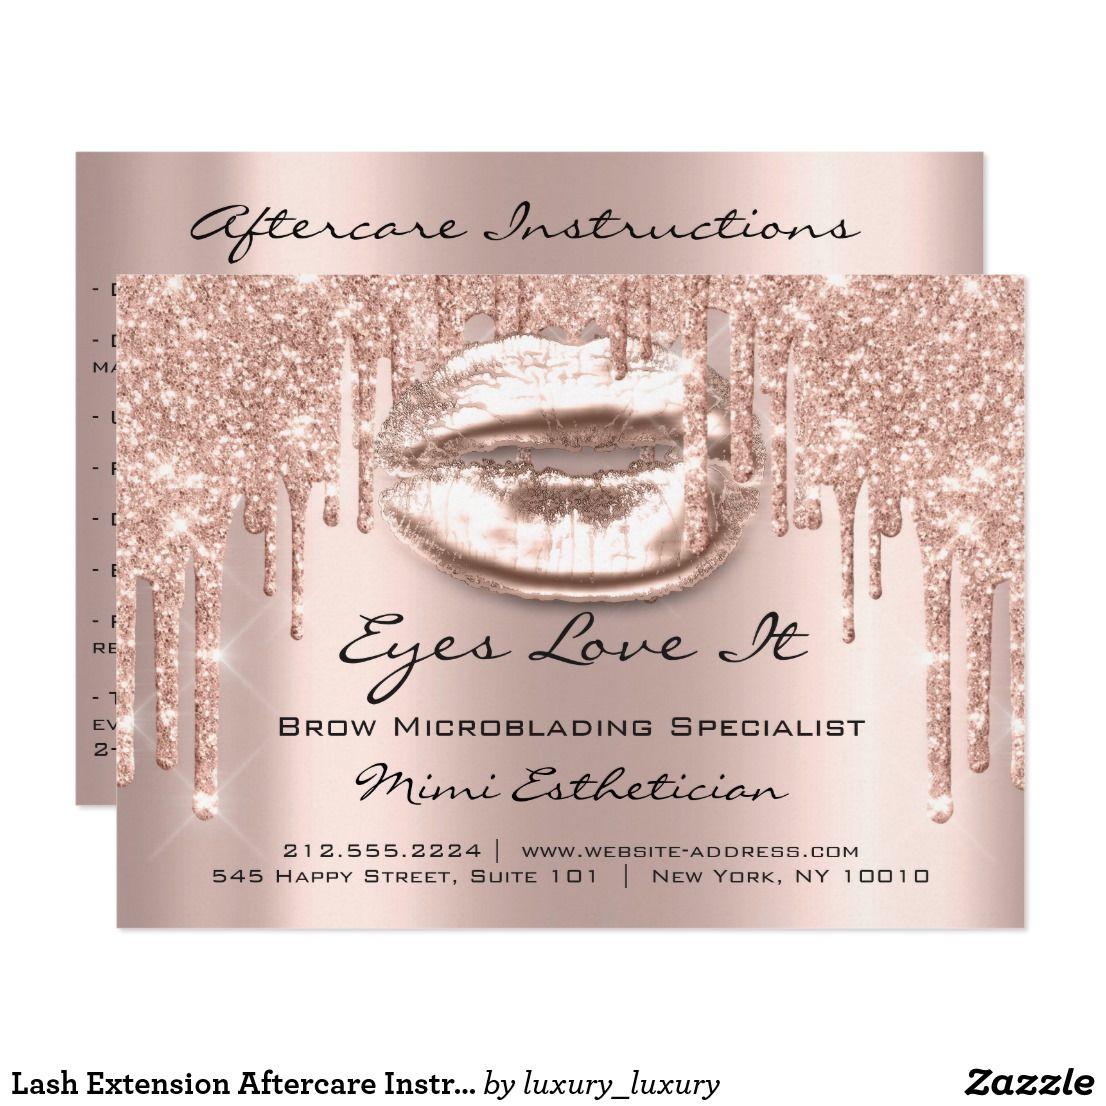 Lash Extension Aftercare Instruction Spark Kiss Invitation